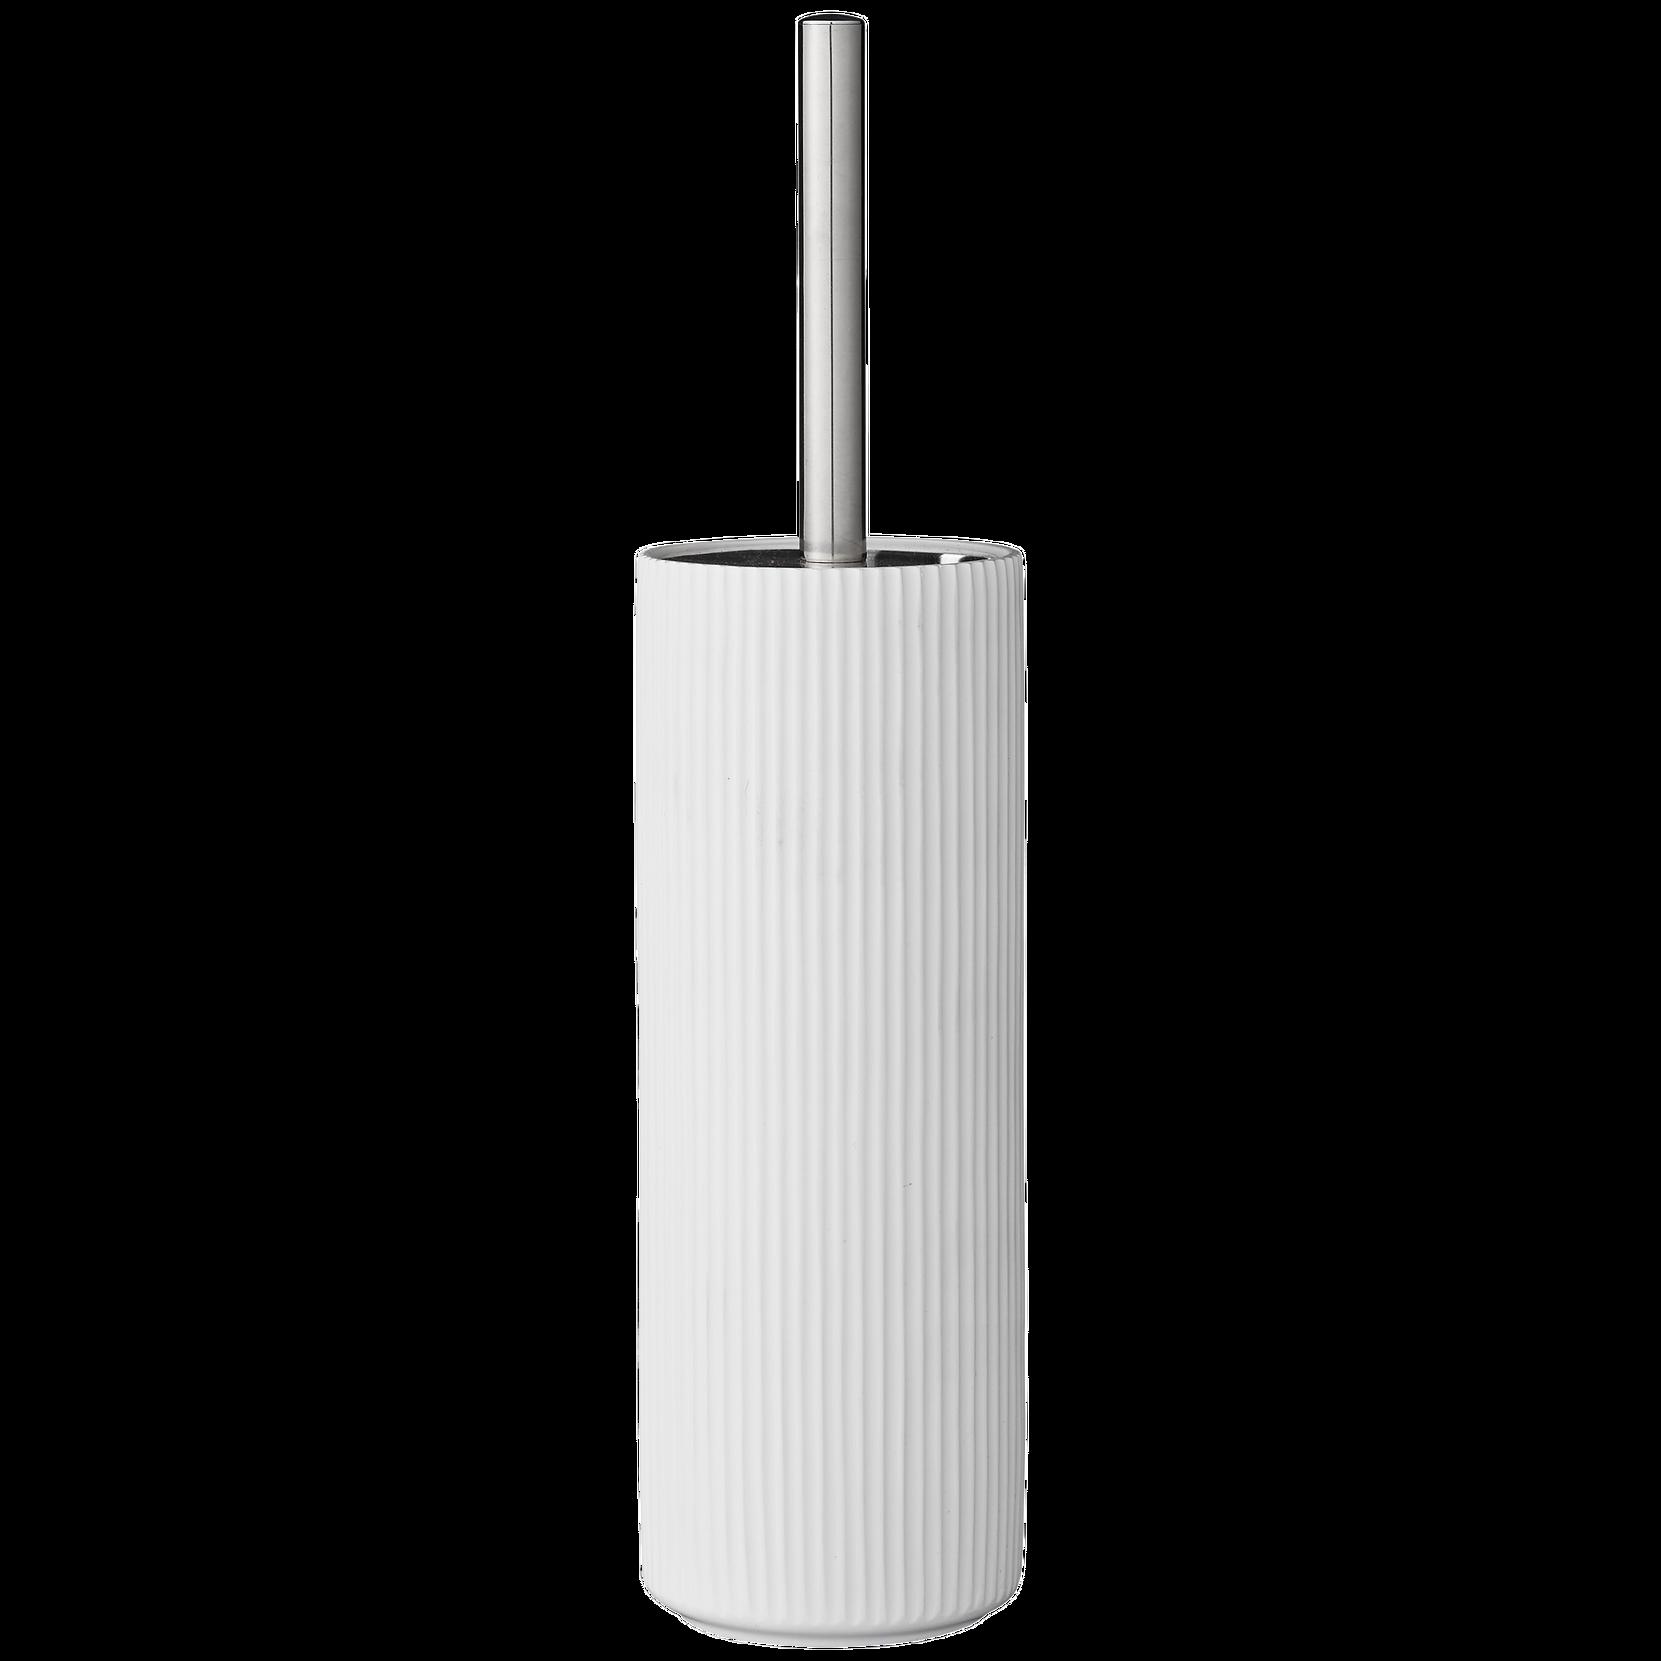 Marlena-WC-harja ja -teline 9 x 37,5 cm